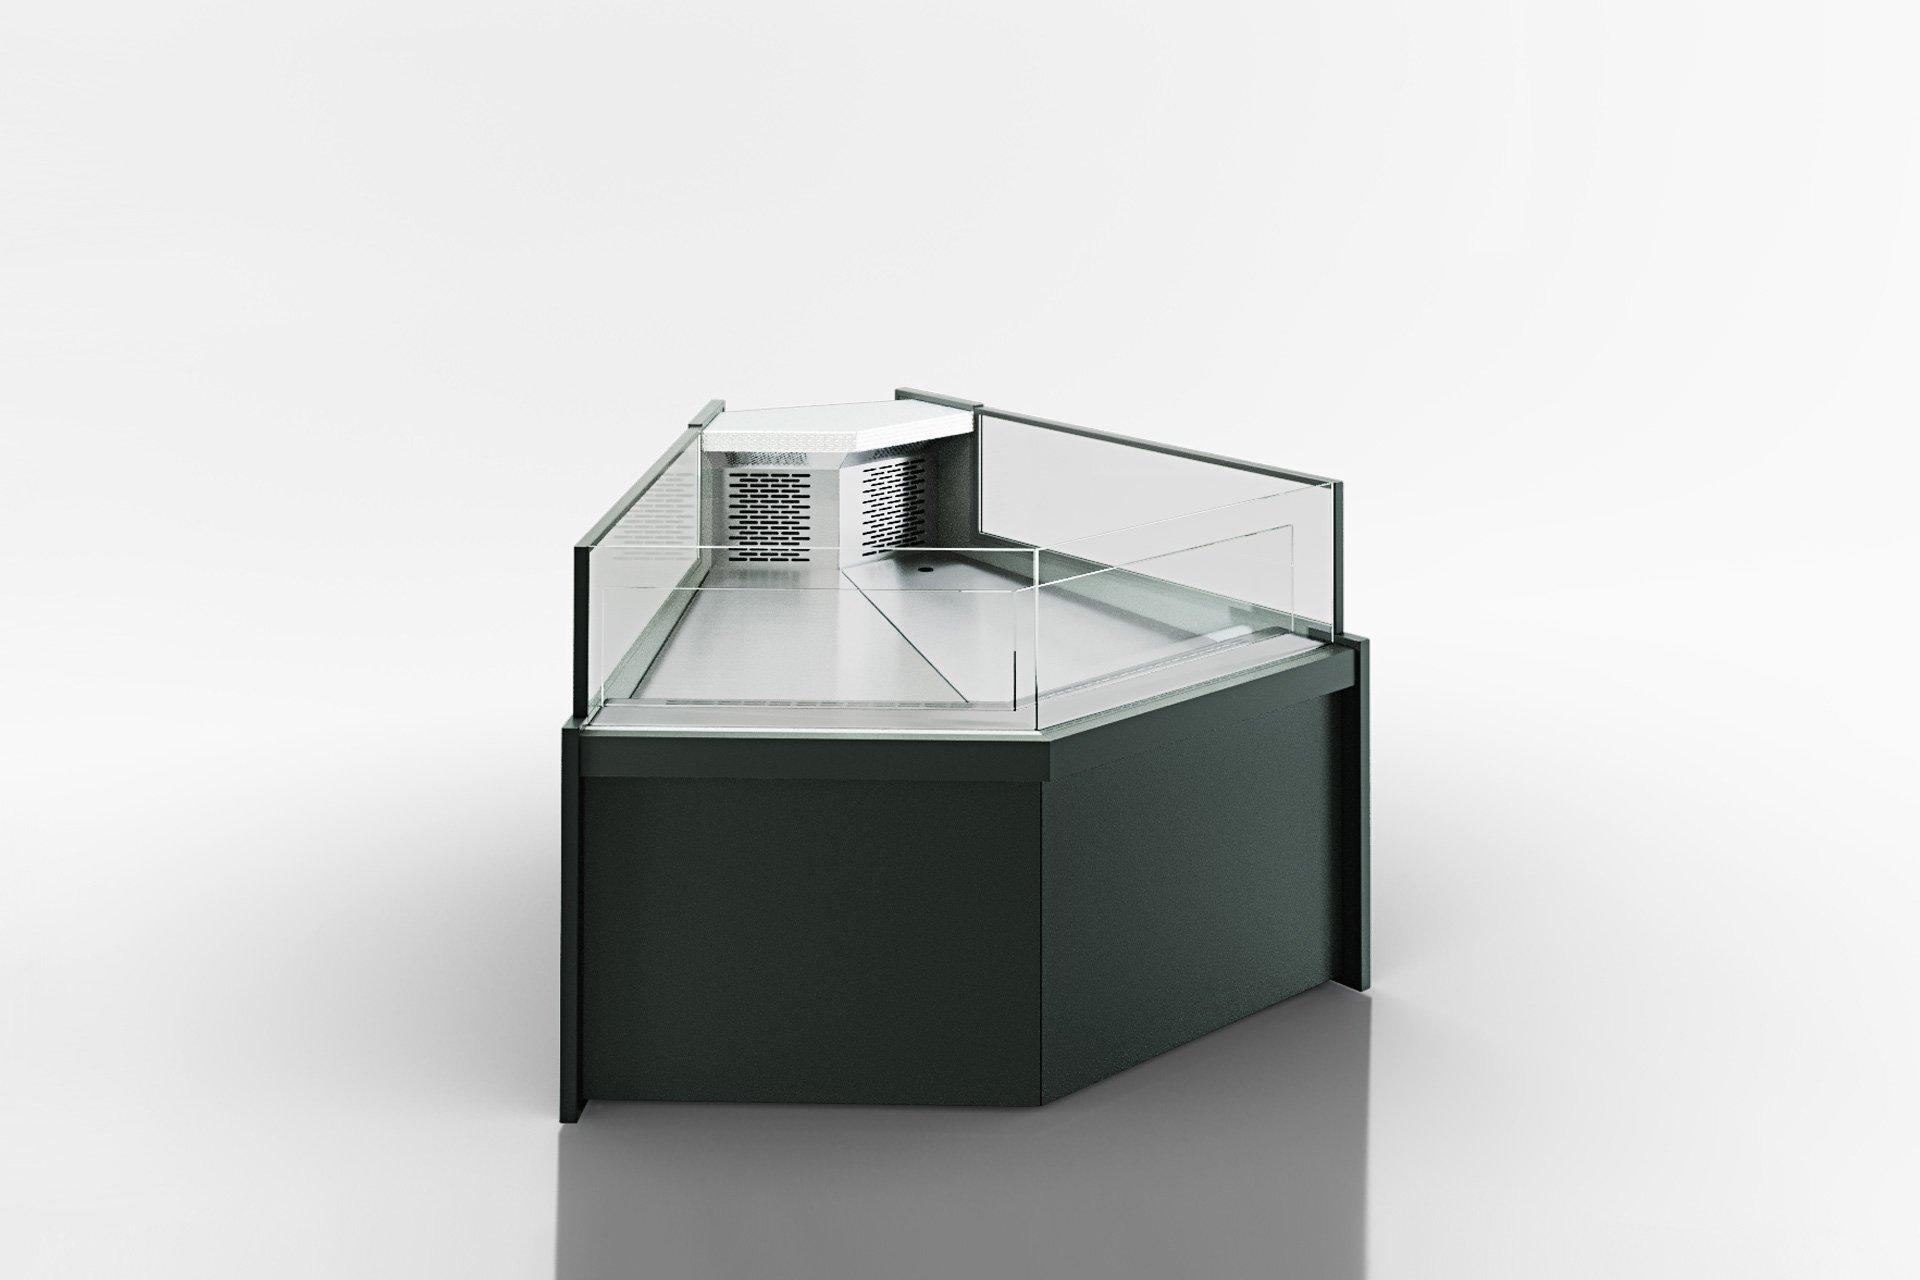 Angular elements of refrigerating counters Missouri сold diamond MC 126 self 084-DBM